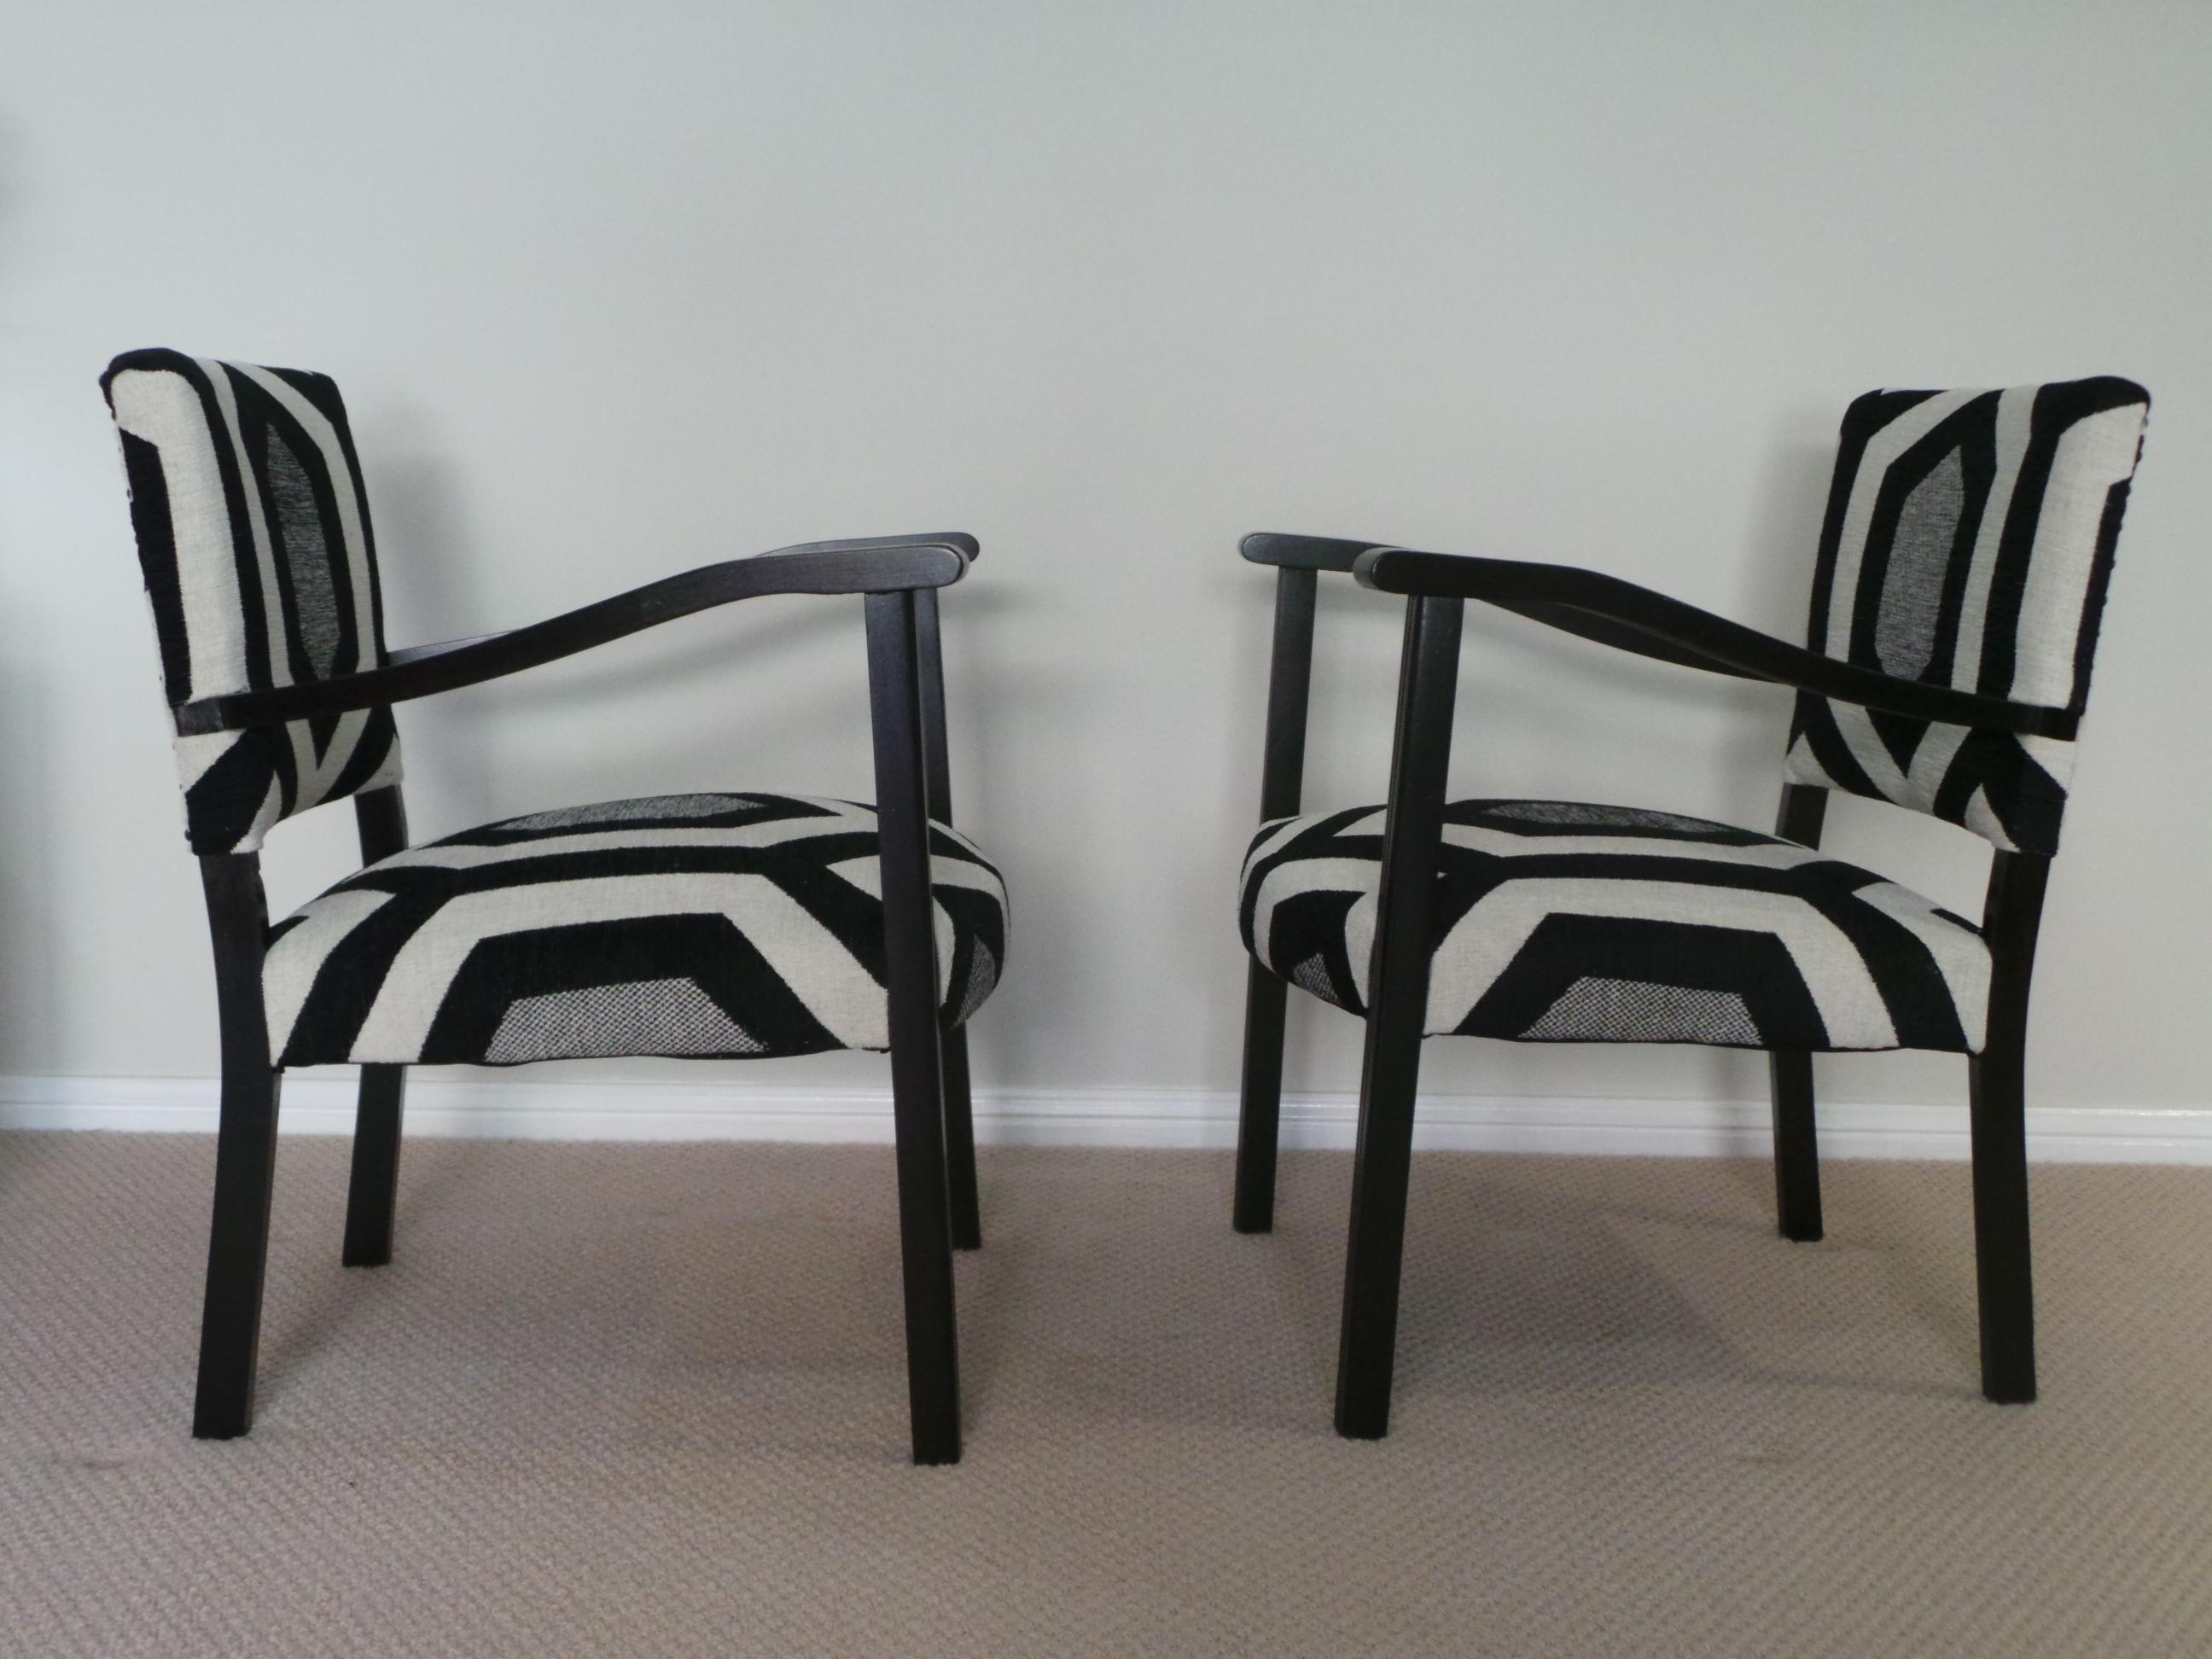 Bridge chairs side